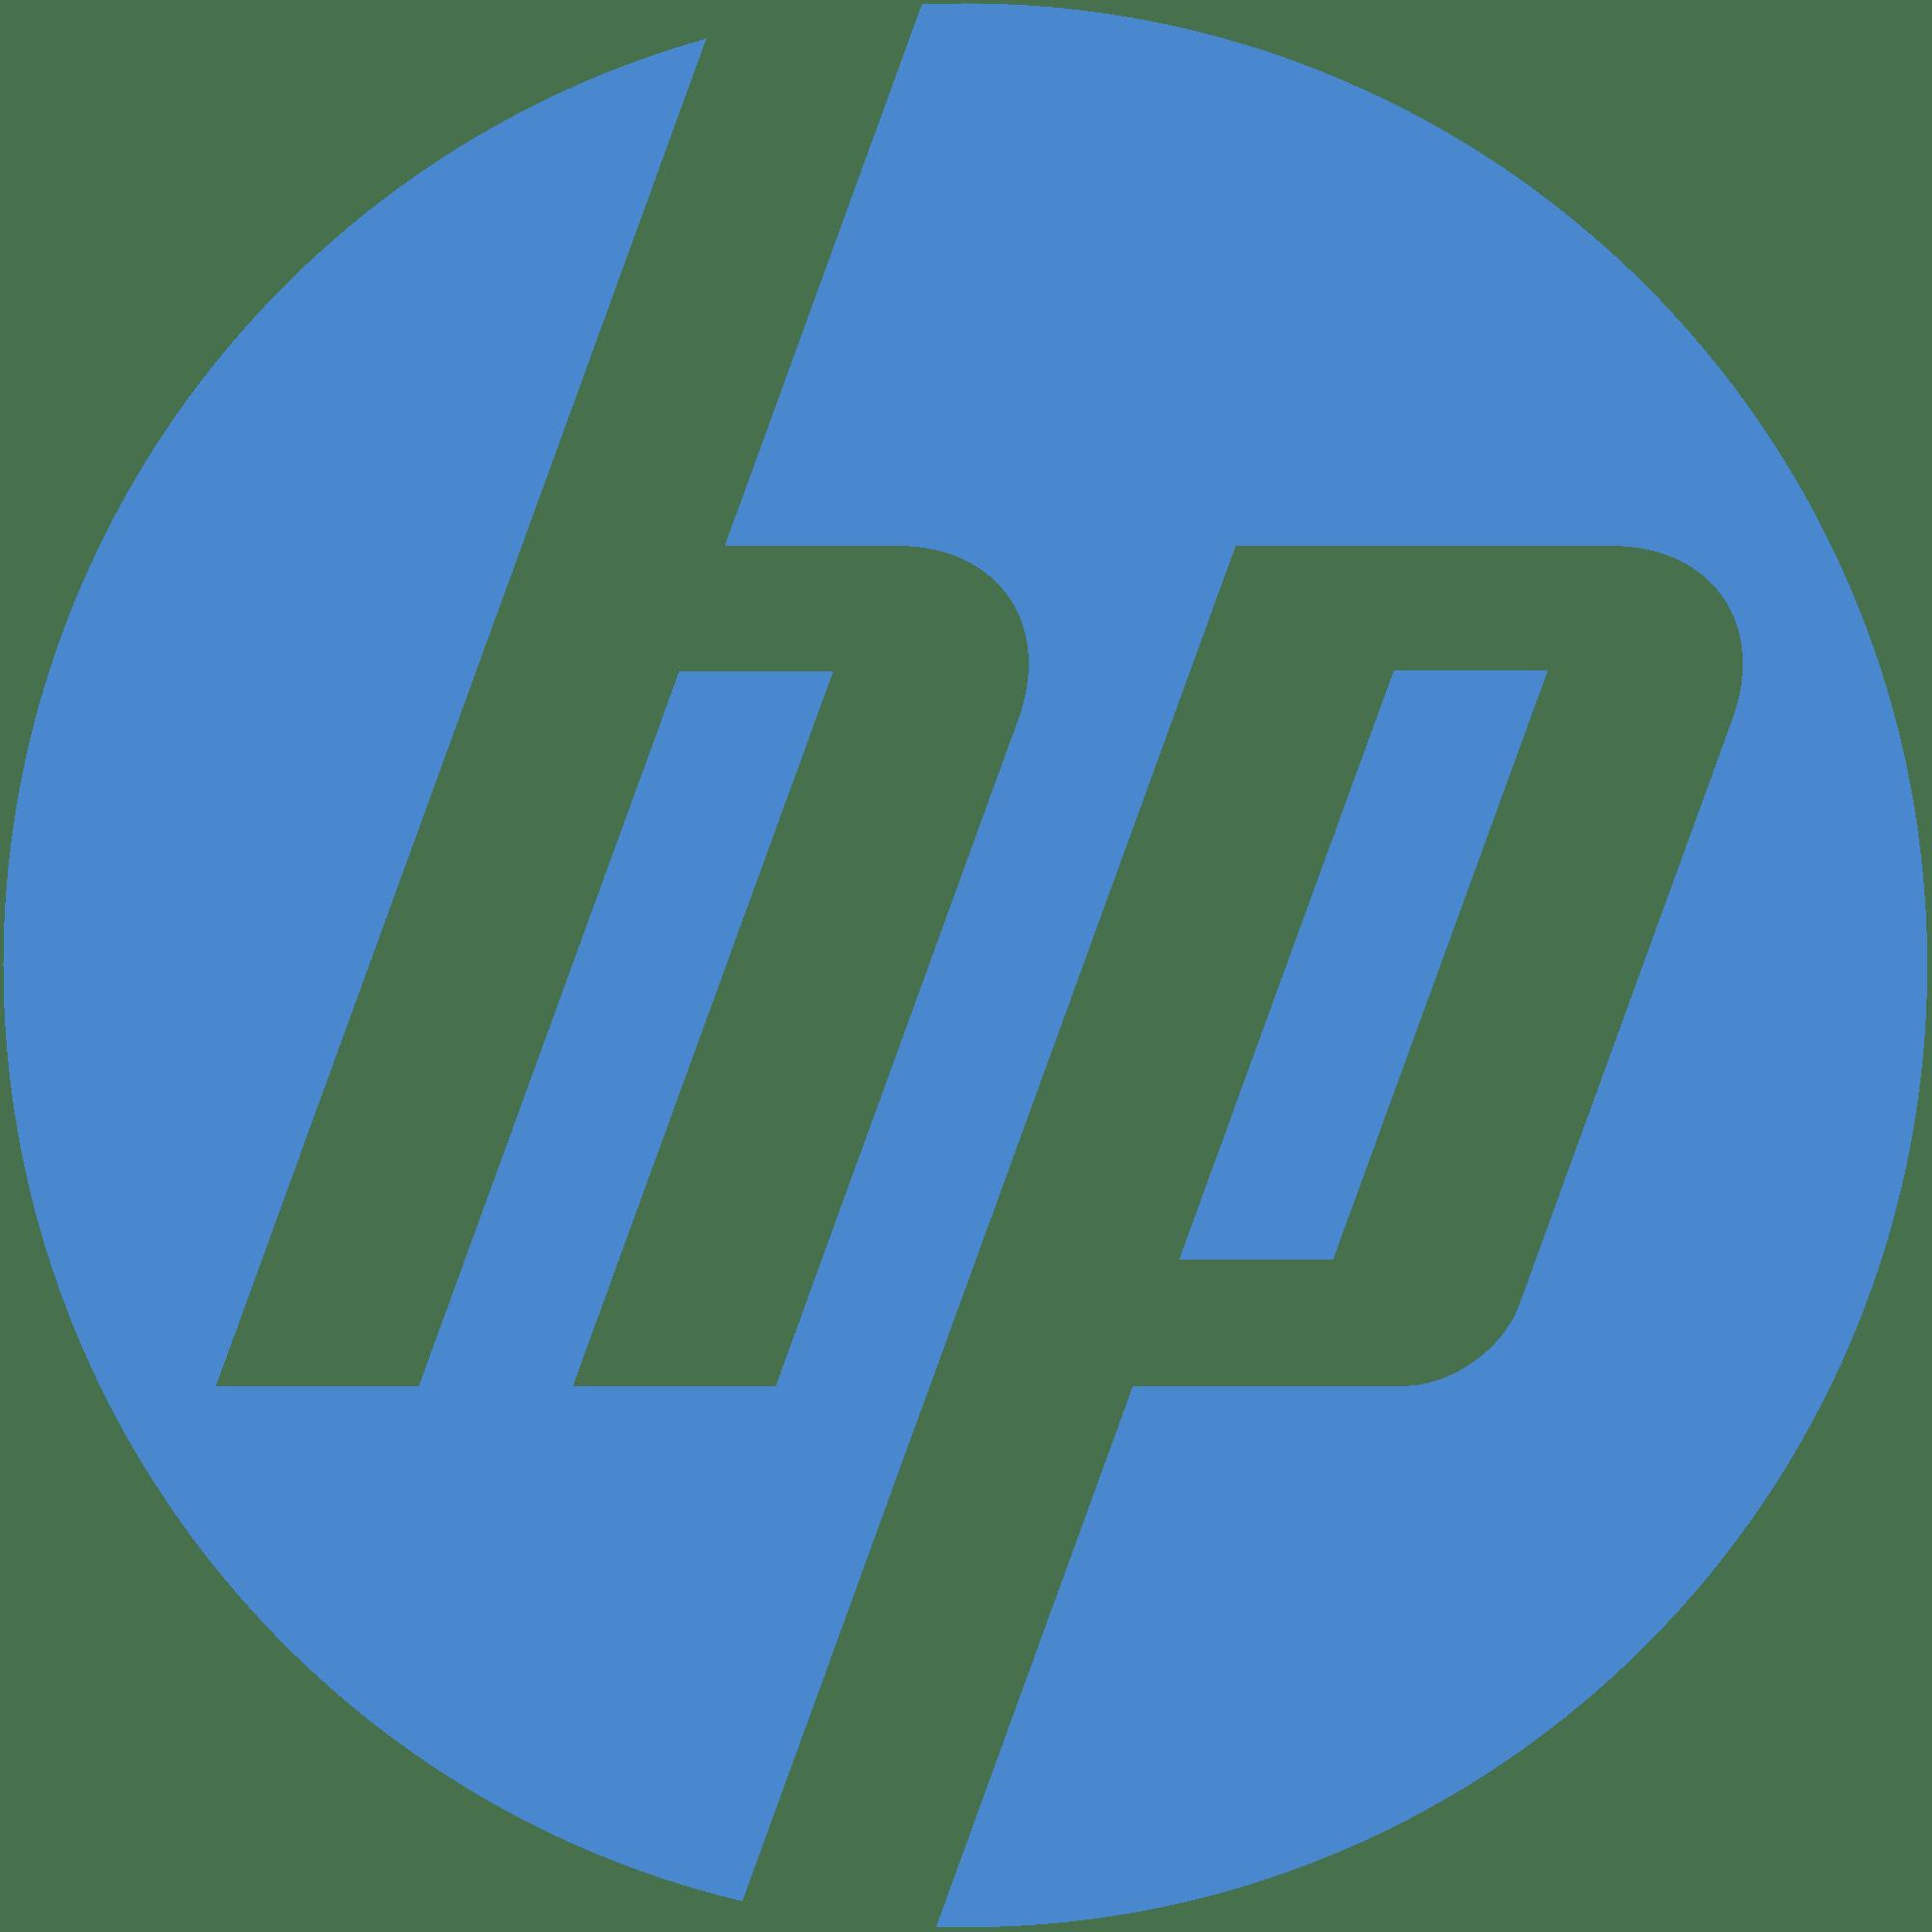 HP w2207h 22 inch LCD Monitor drivers